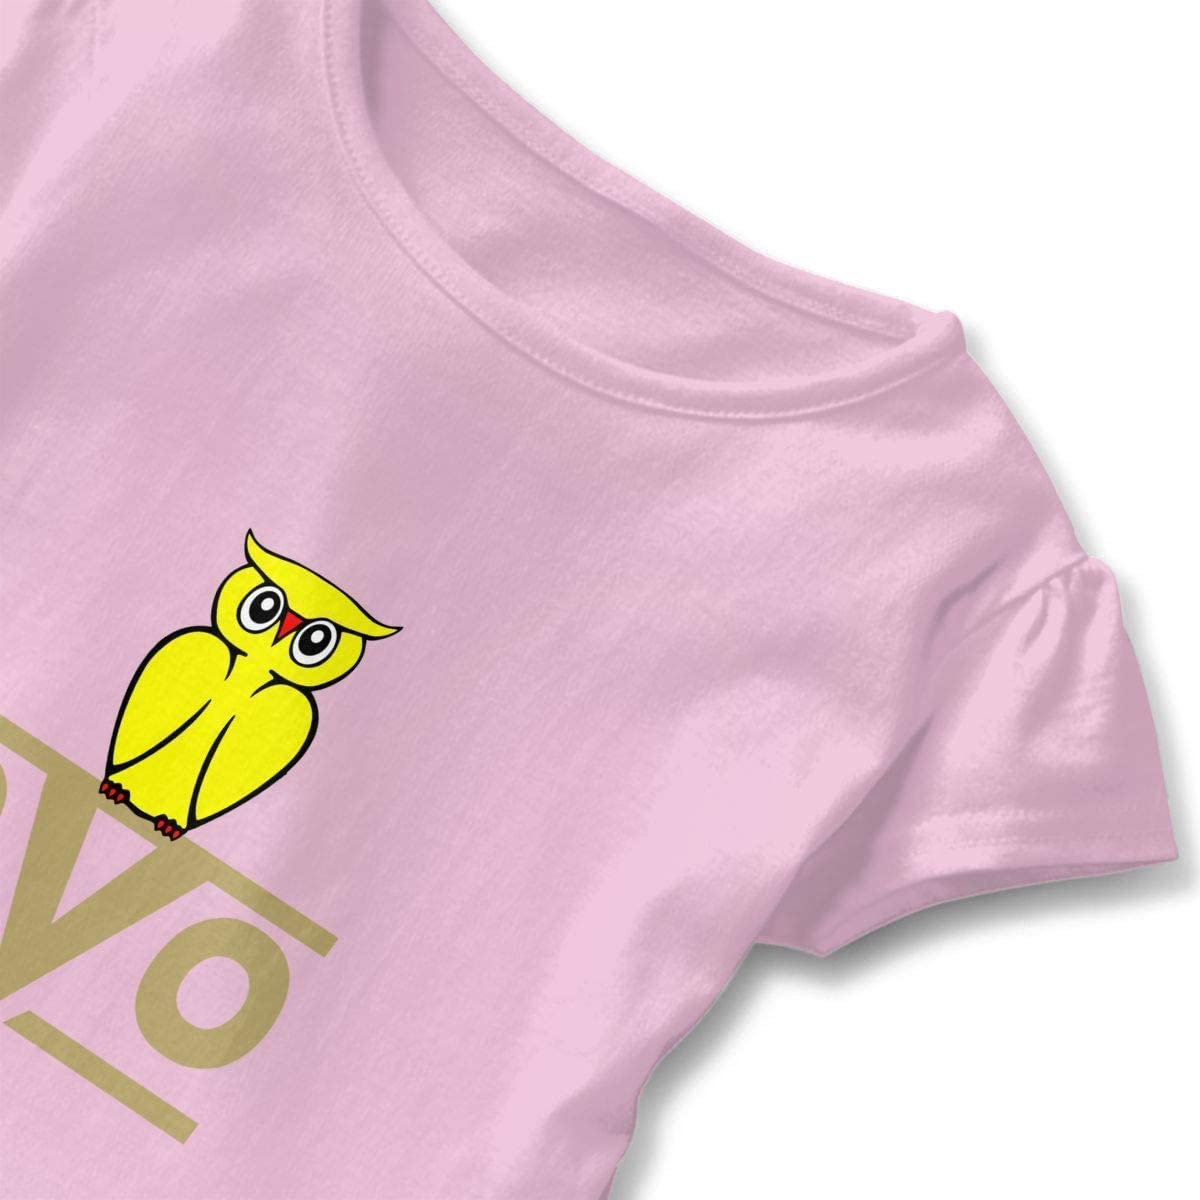 Toddler Girls Ruffle T-Shirt OVO Owl Short Sleeve 2-6T